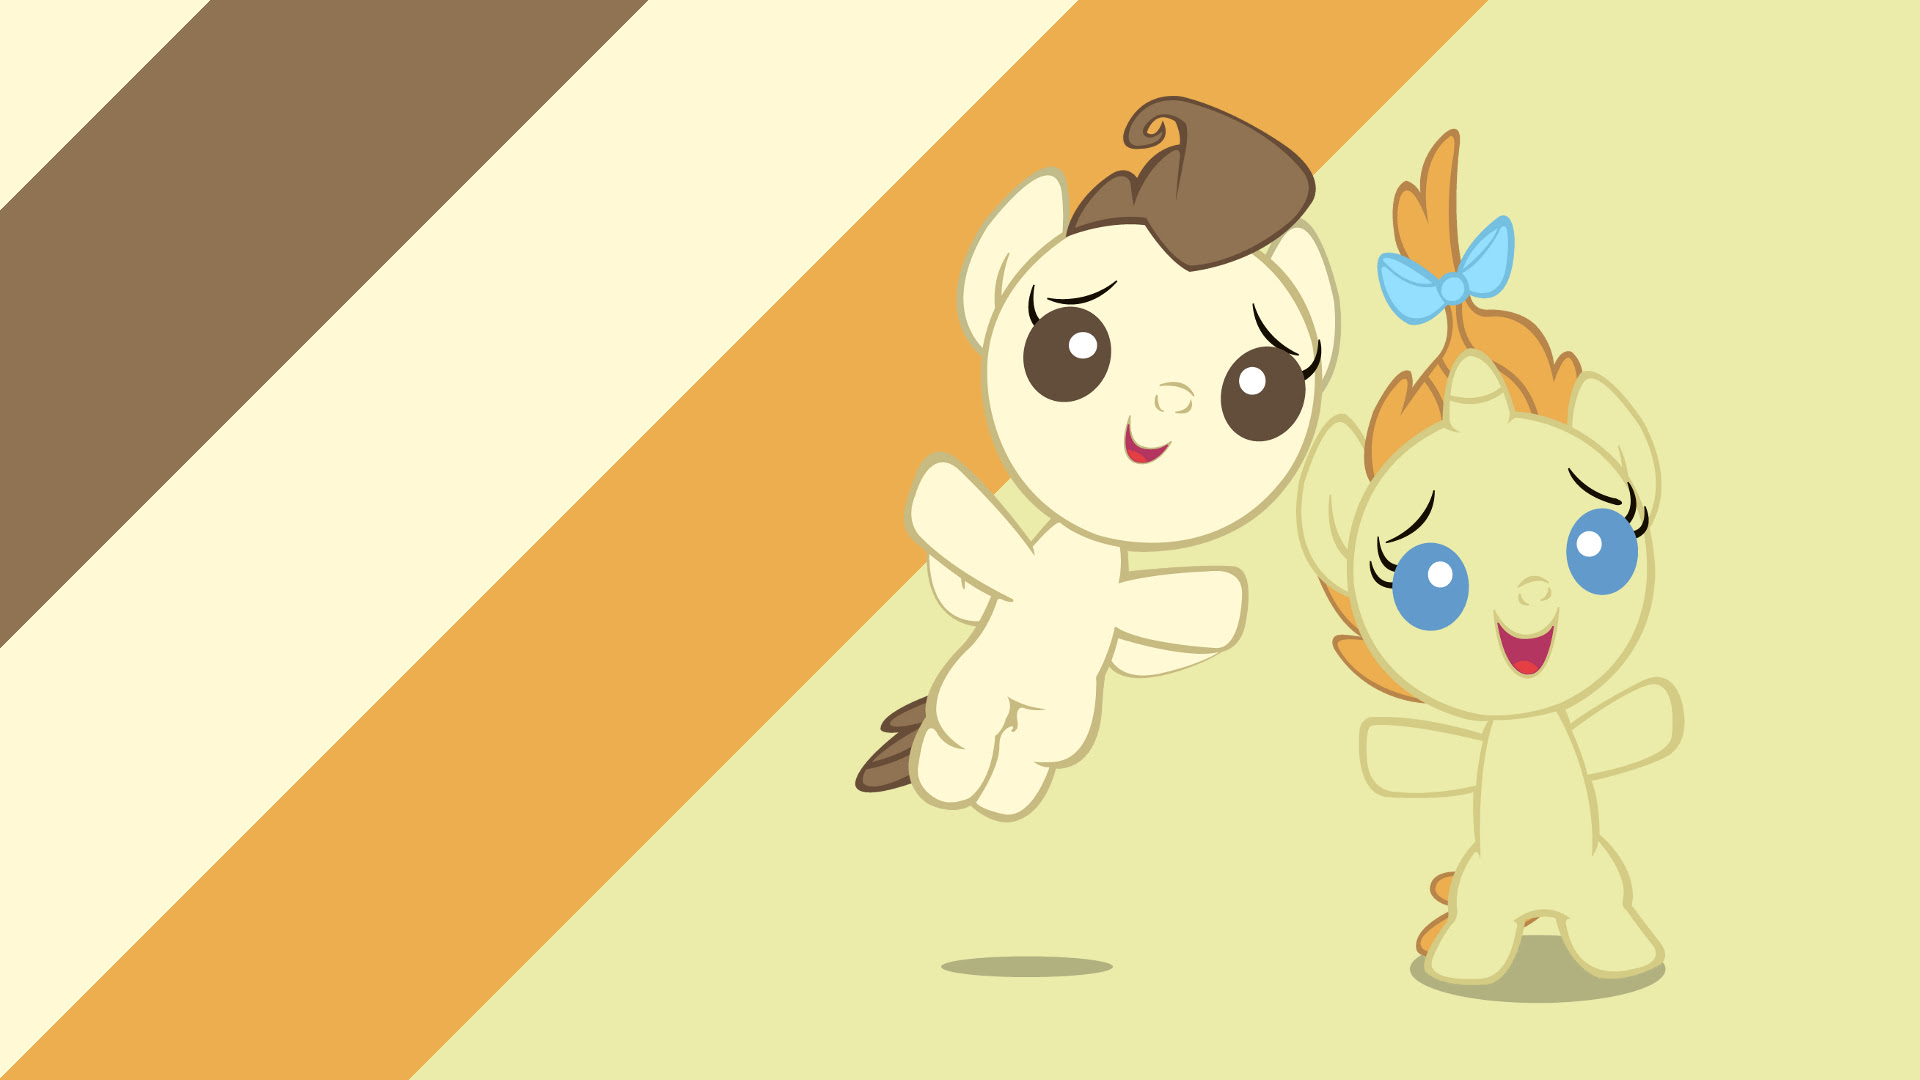 Minor Pony Wallpaper My Little Pony Friendship Is Magic